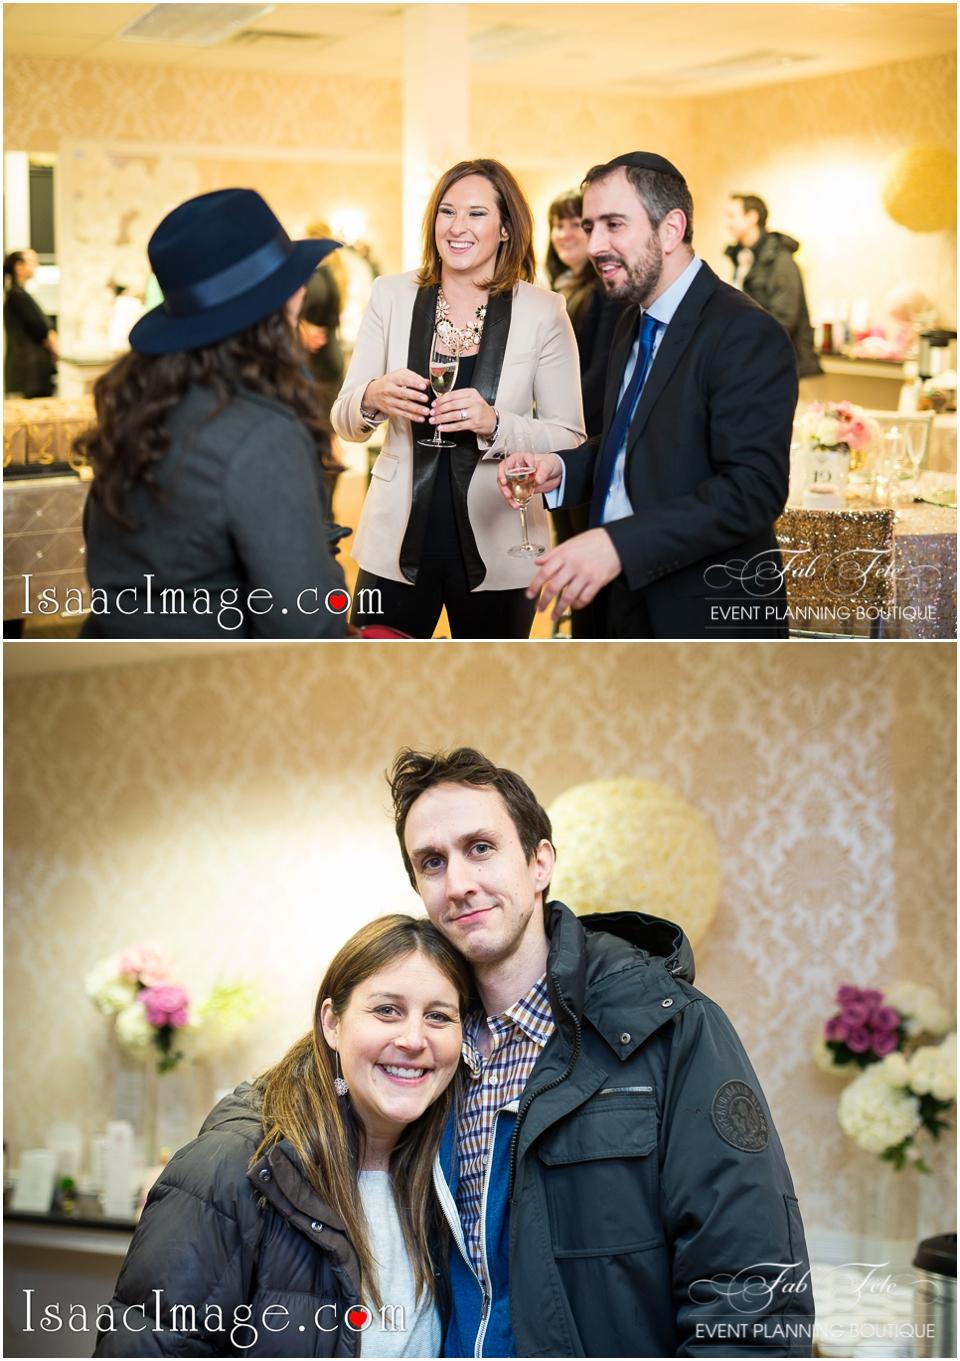 Fab Fete Toronto Wedding Event Planning Boutique open house_6464.jpg